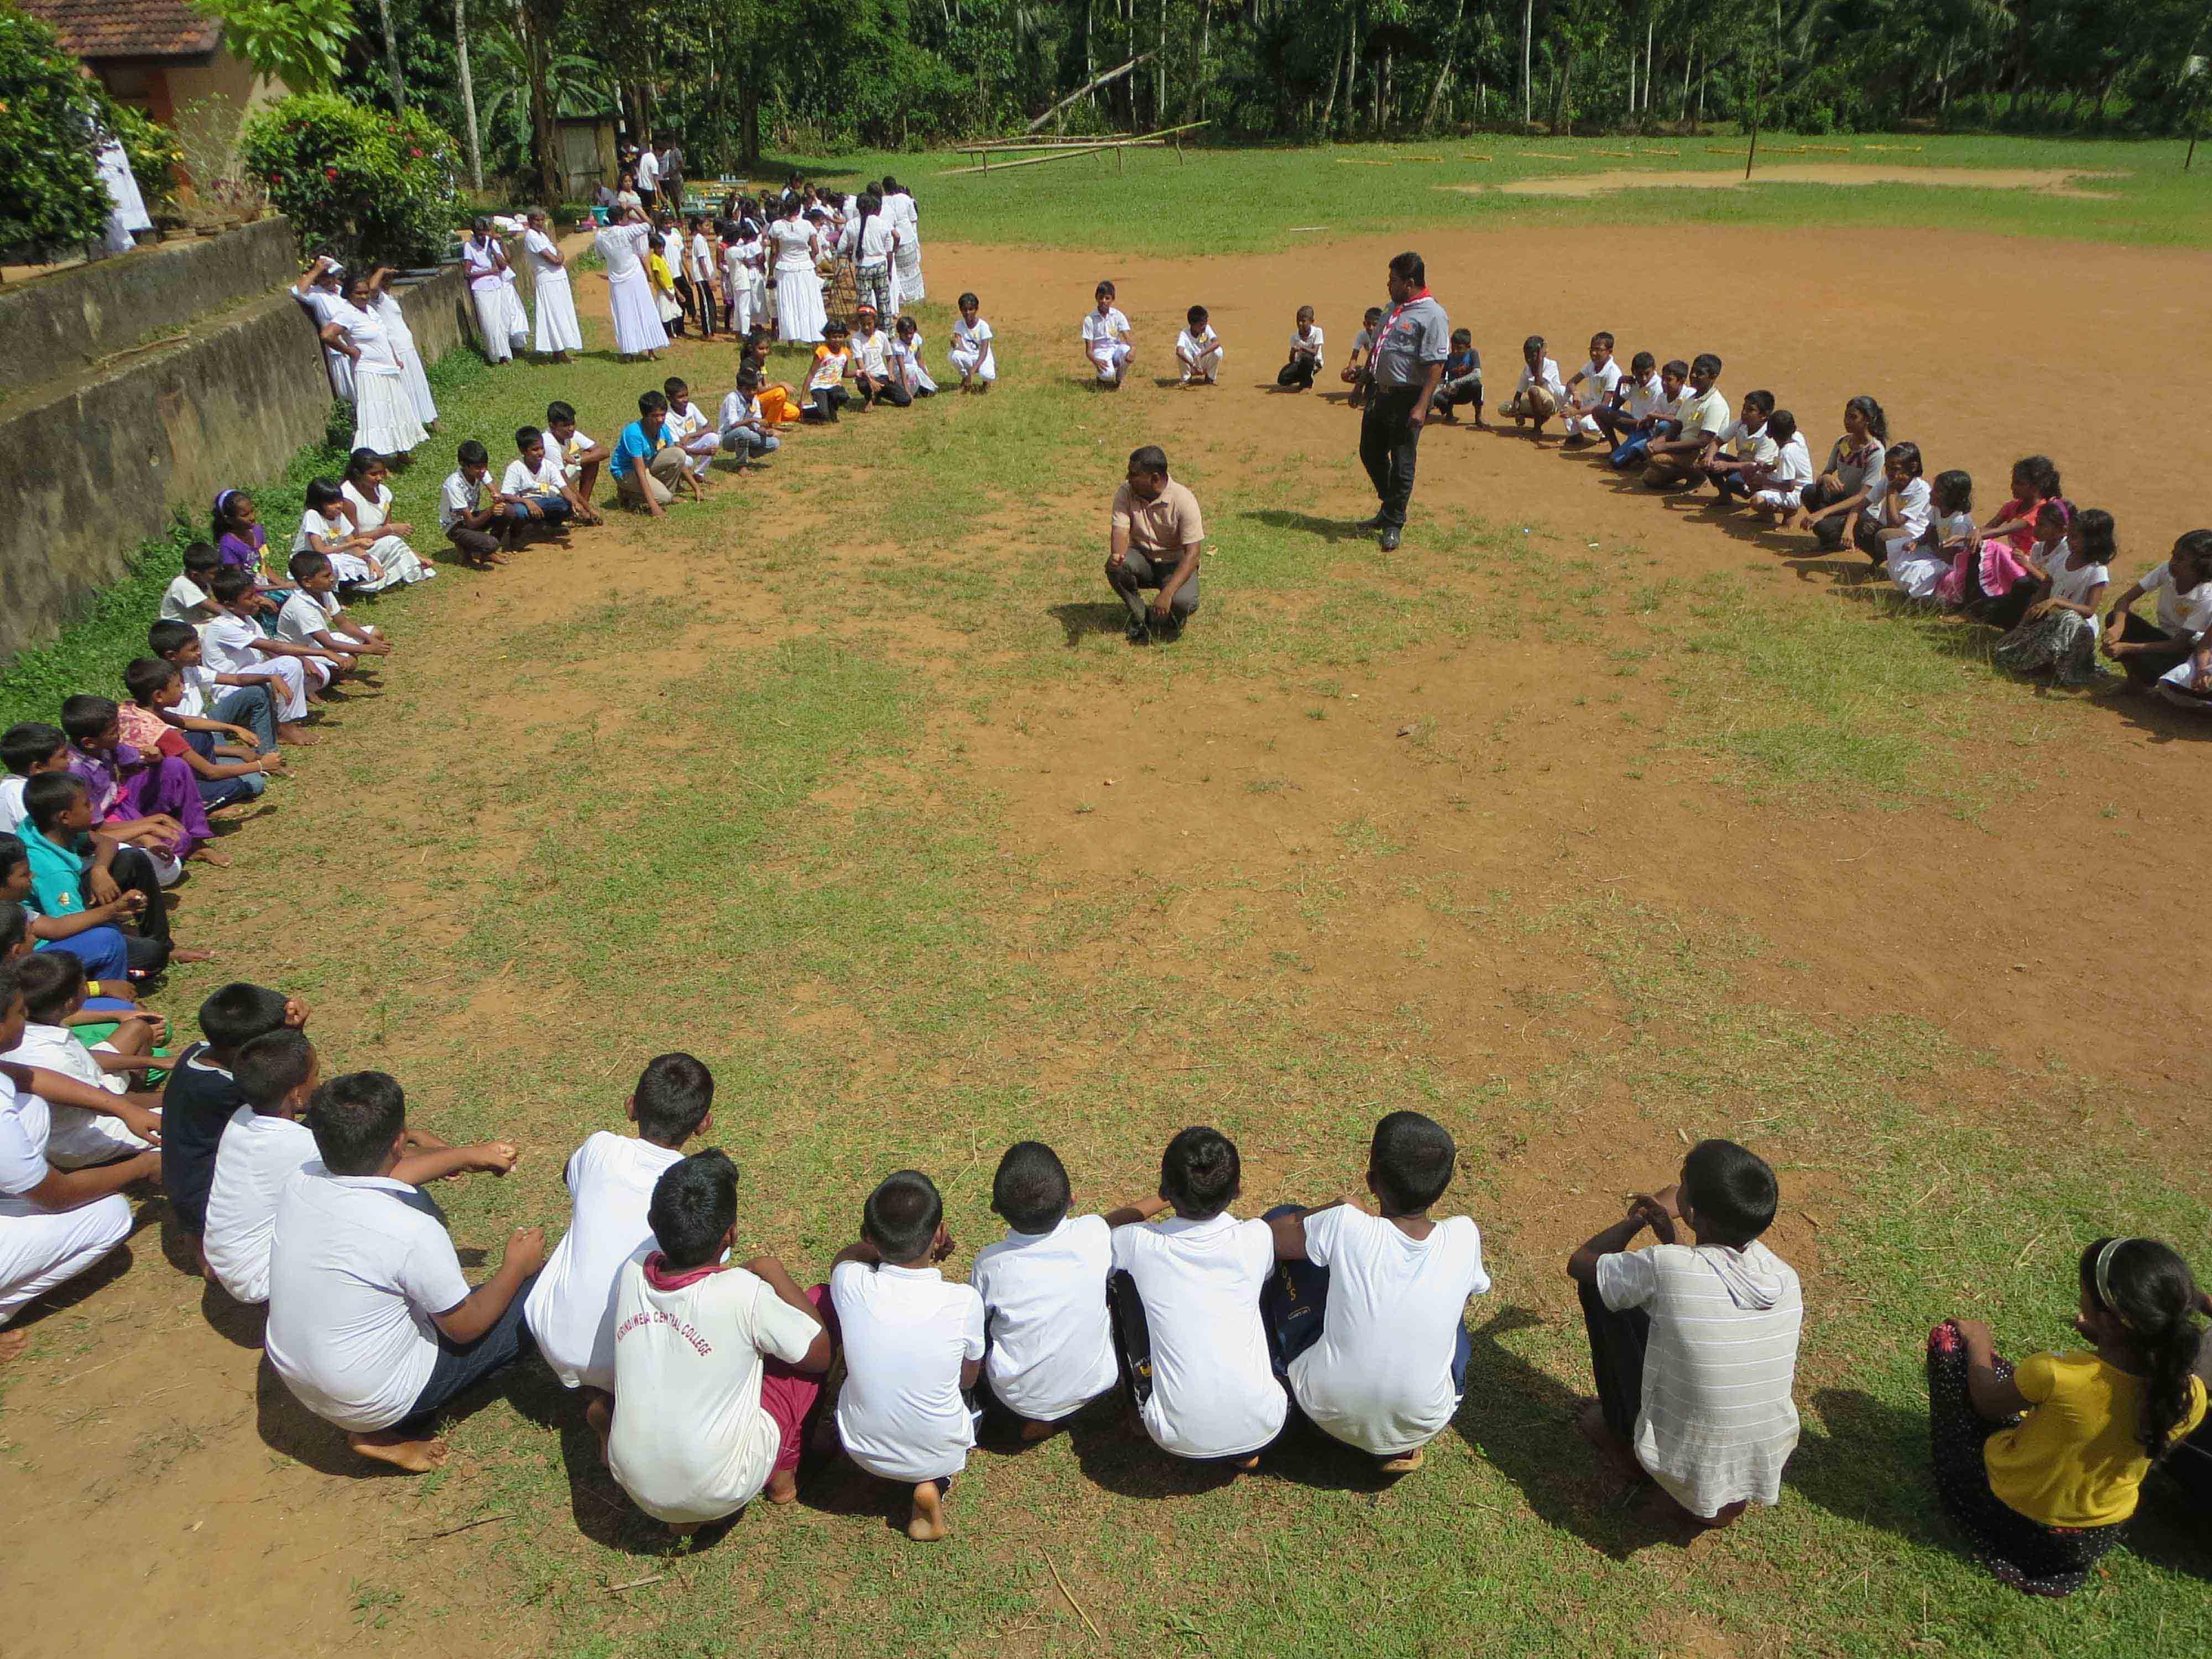 Sati Pasala Mindfulness Camp at Meethirigala Kanishta Vidyalaya-scouting activities (3)